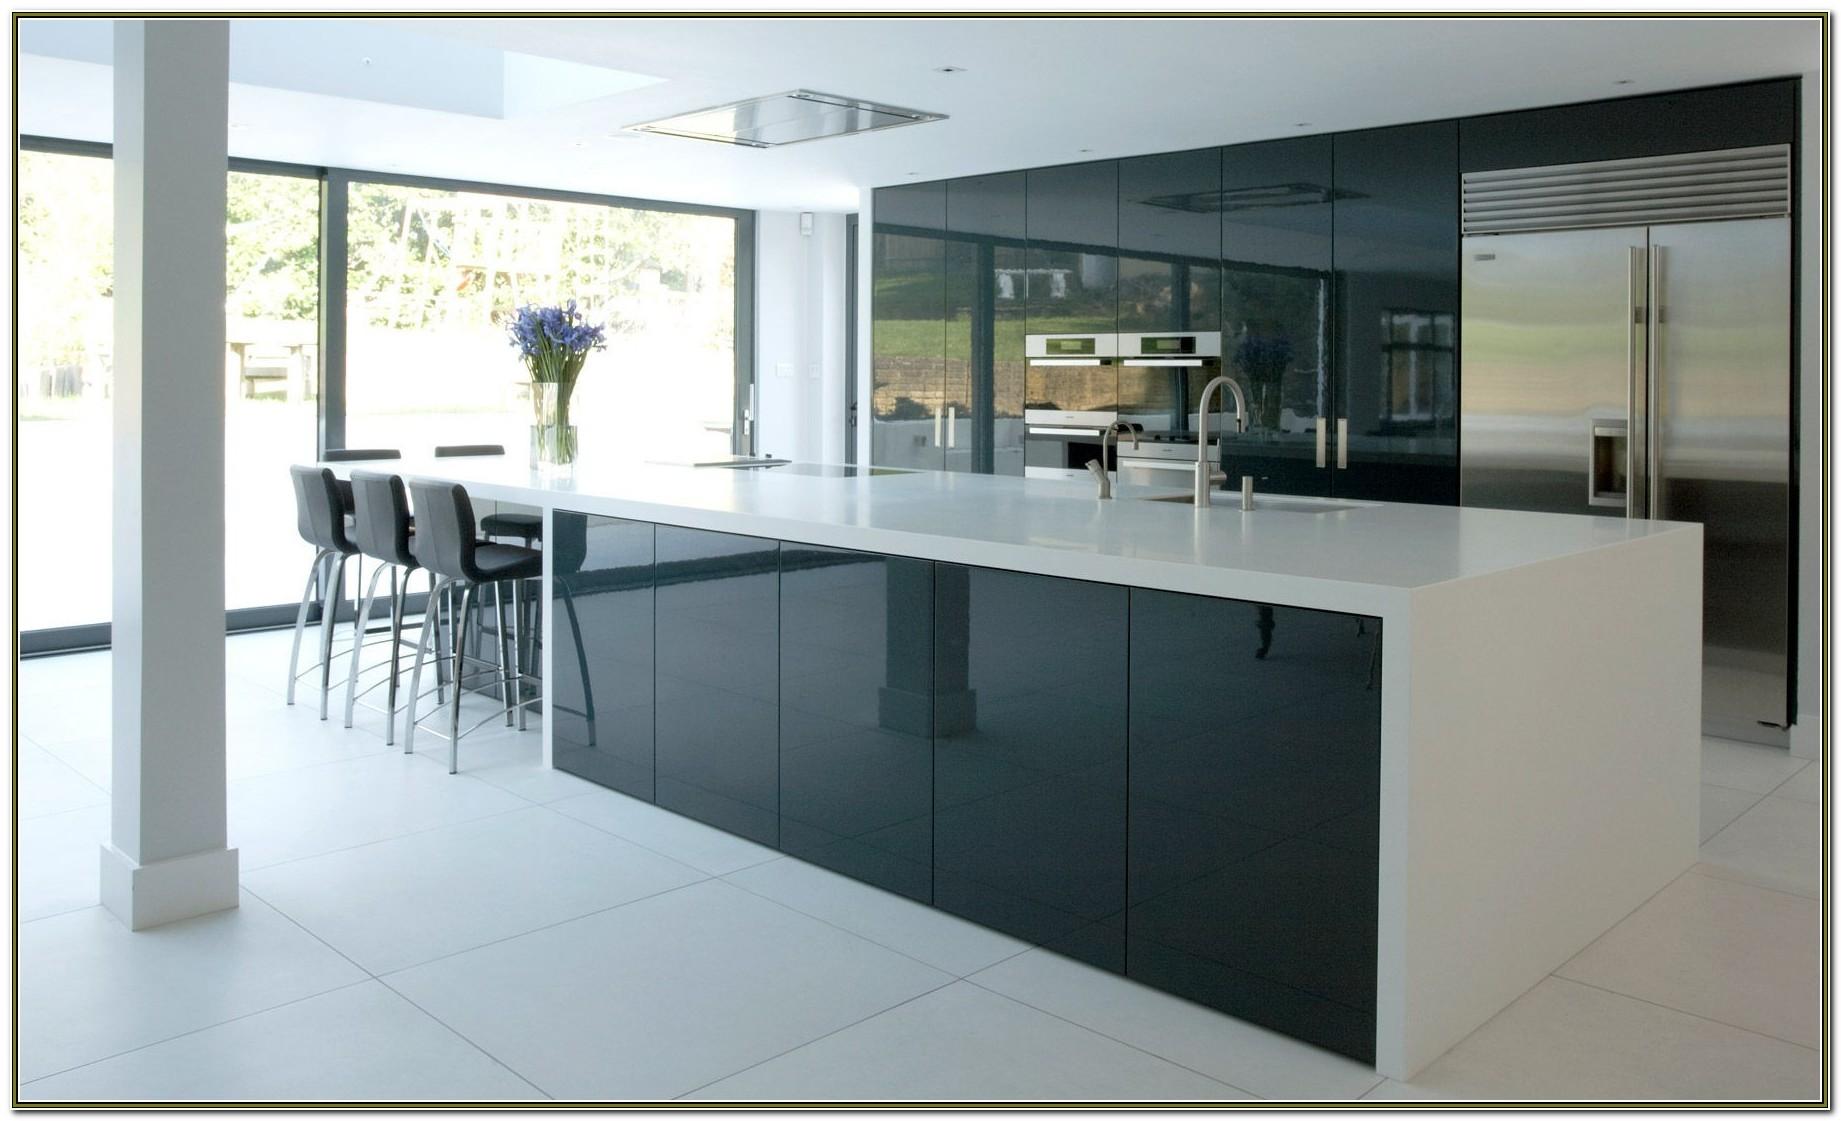 Ikea High Gloss White Cabinet Doors Cabinet Home Design Ideas Voydyyyvk4